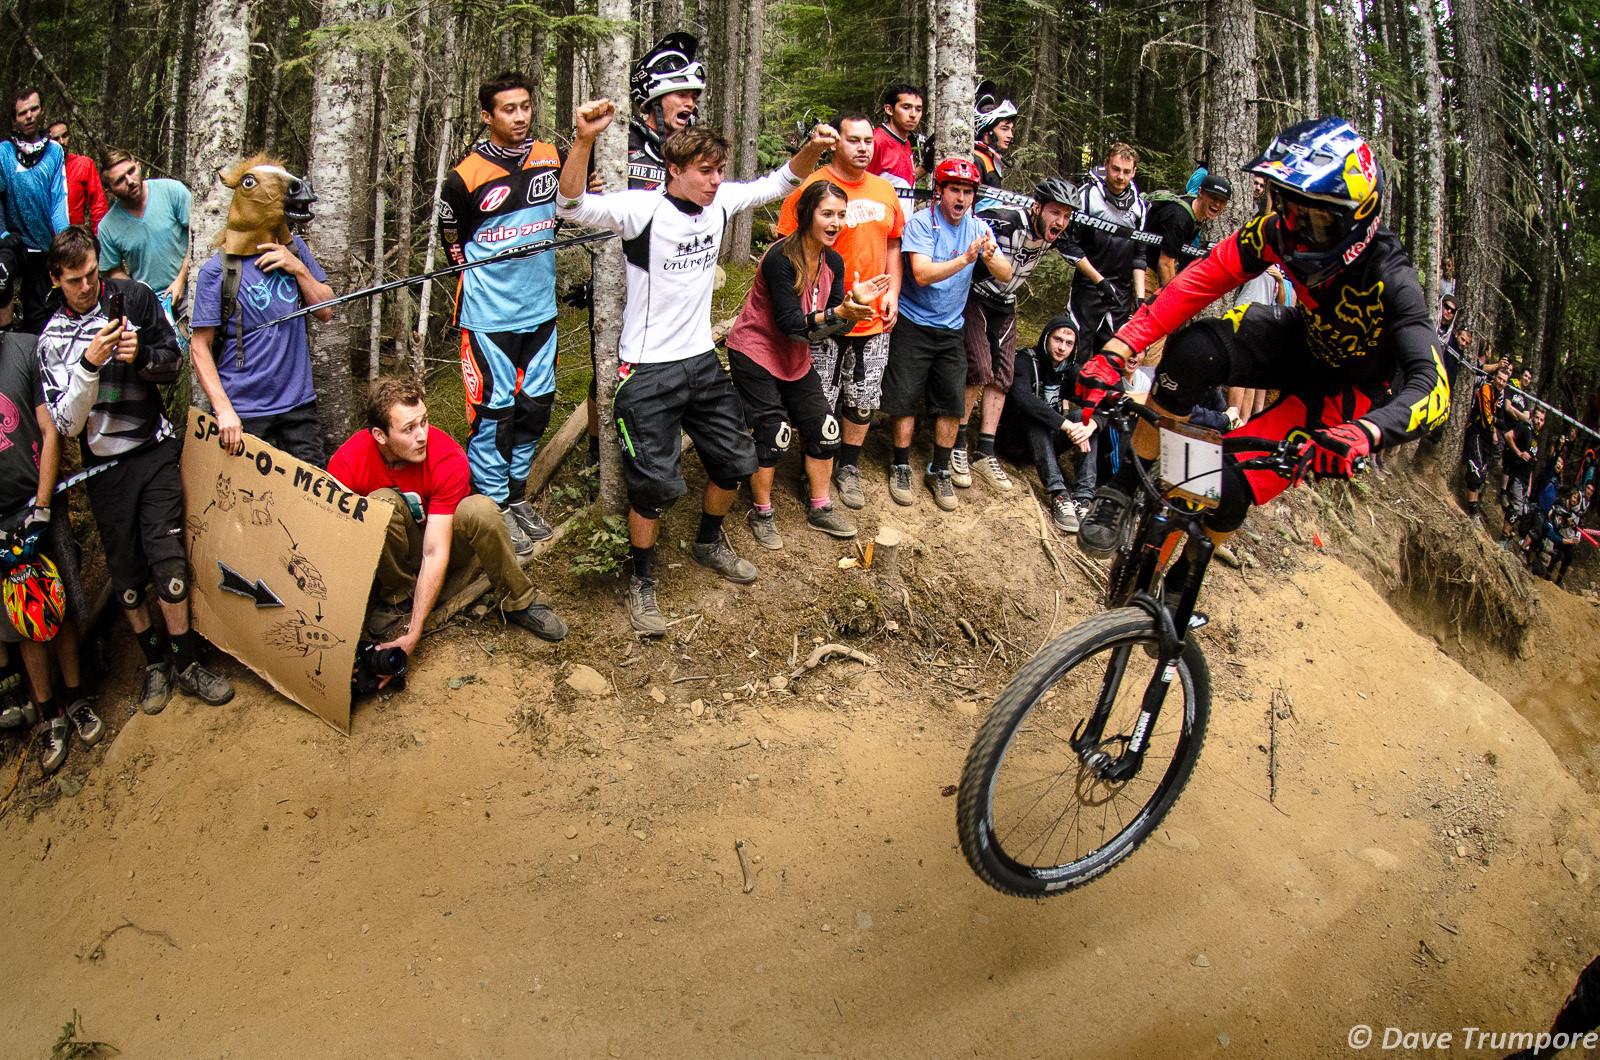 Steve Smith Wins Crankworx Air DH - Crankworx Whistler Air DH - Mountain Biking Pictures - Vital MTB